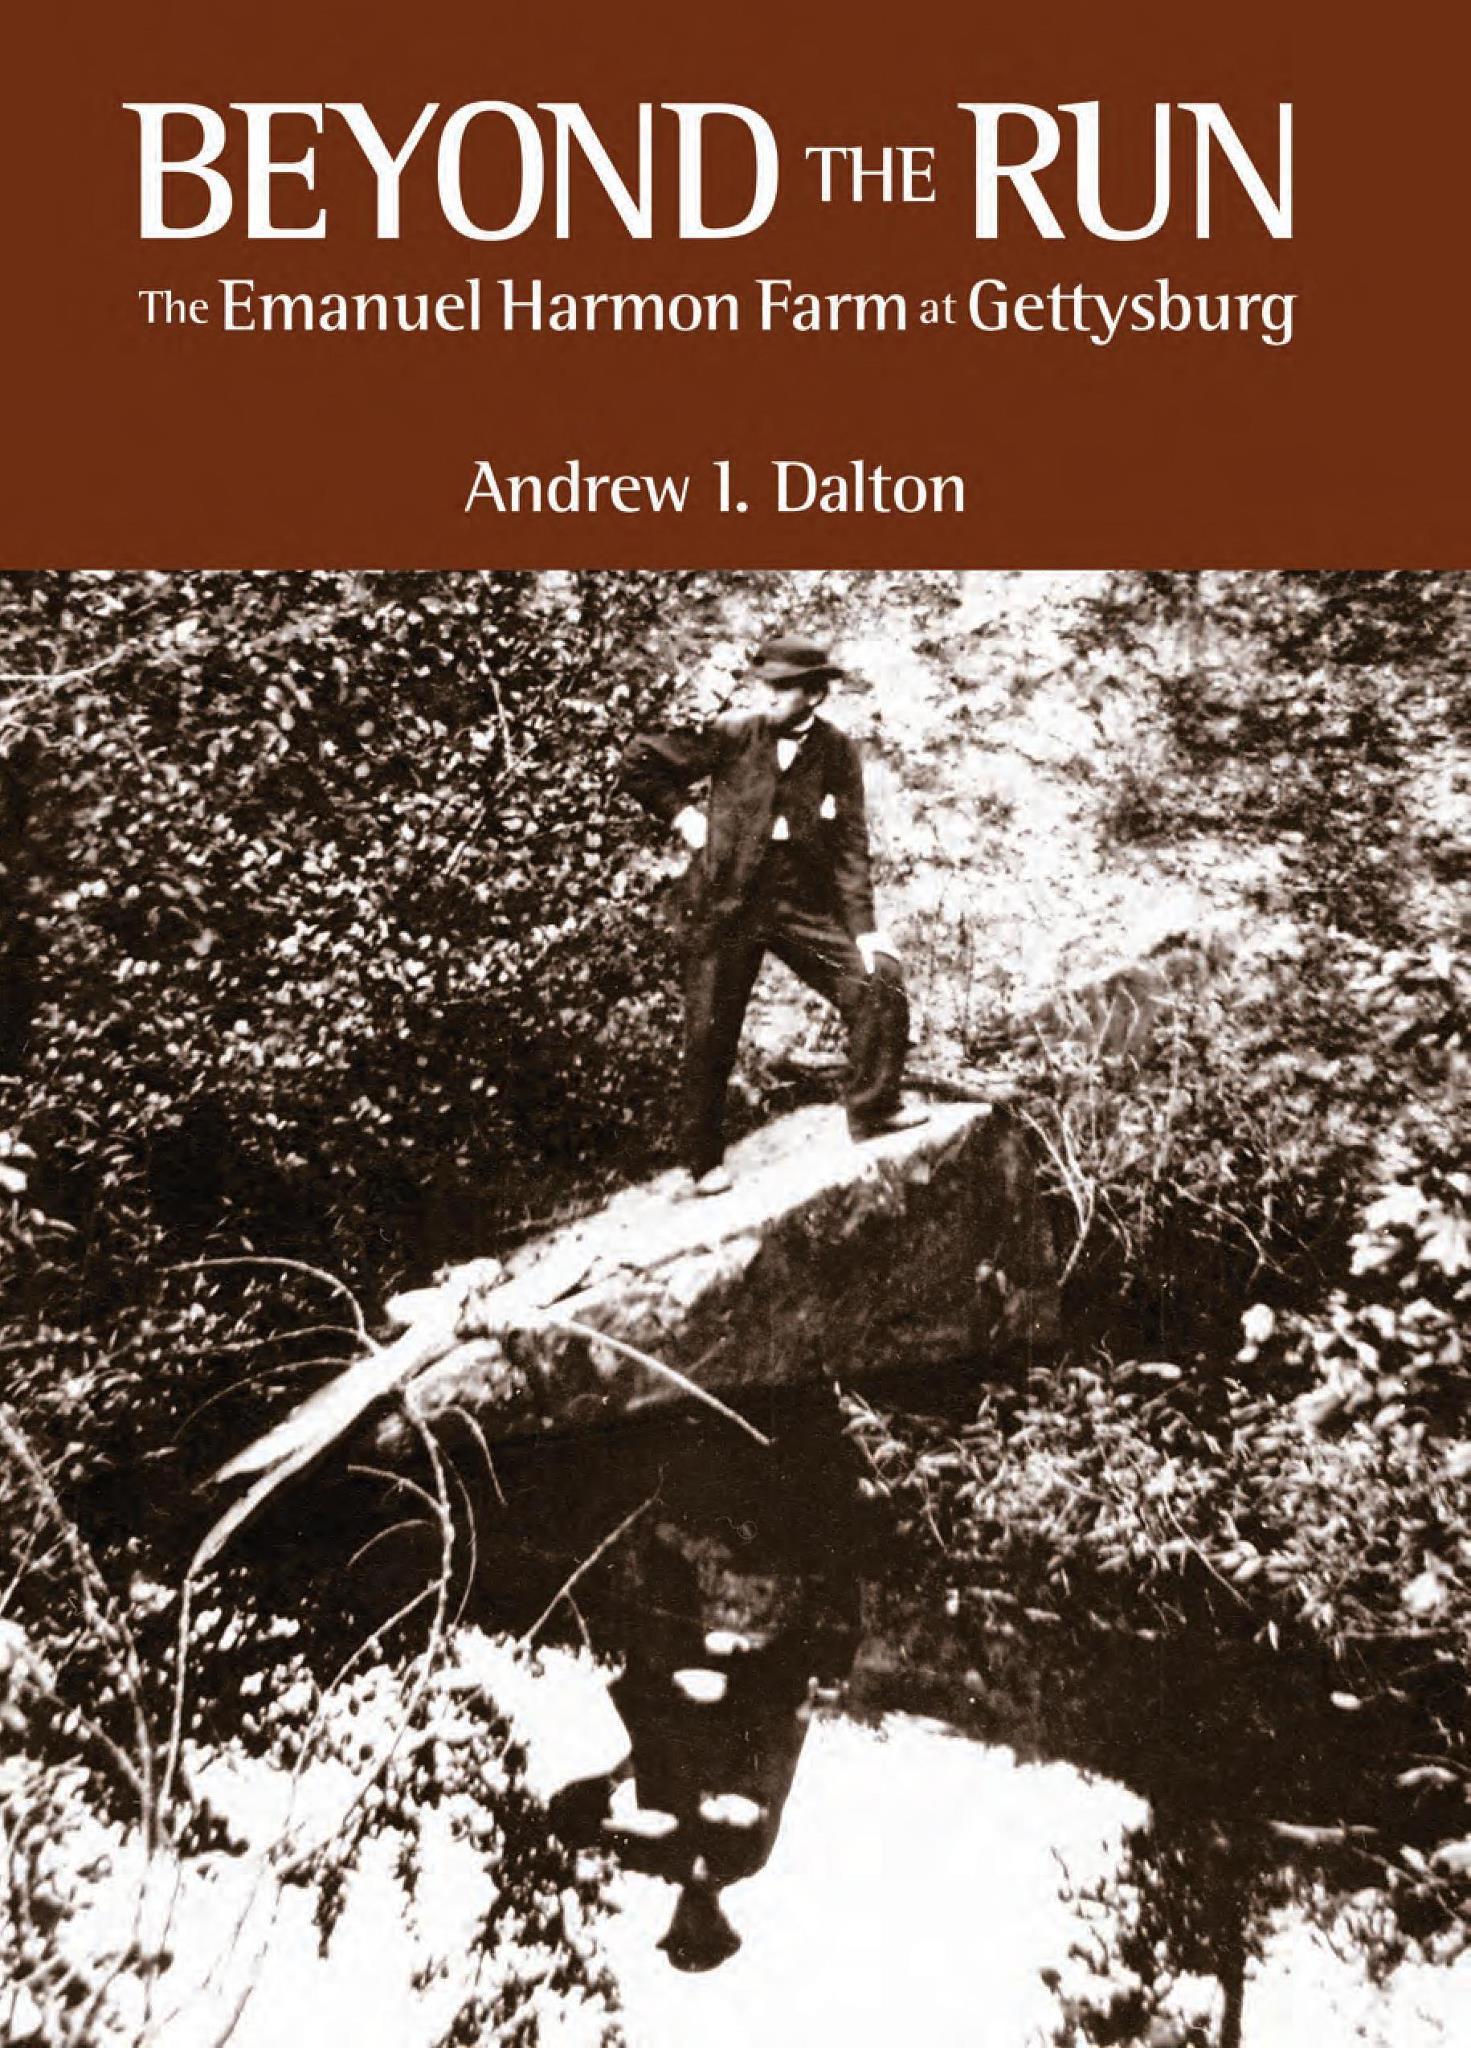 Beyond The Run: The Emanuel Harmon Farm at Gettysburg